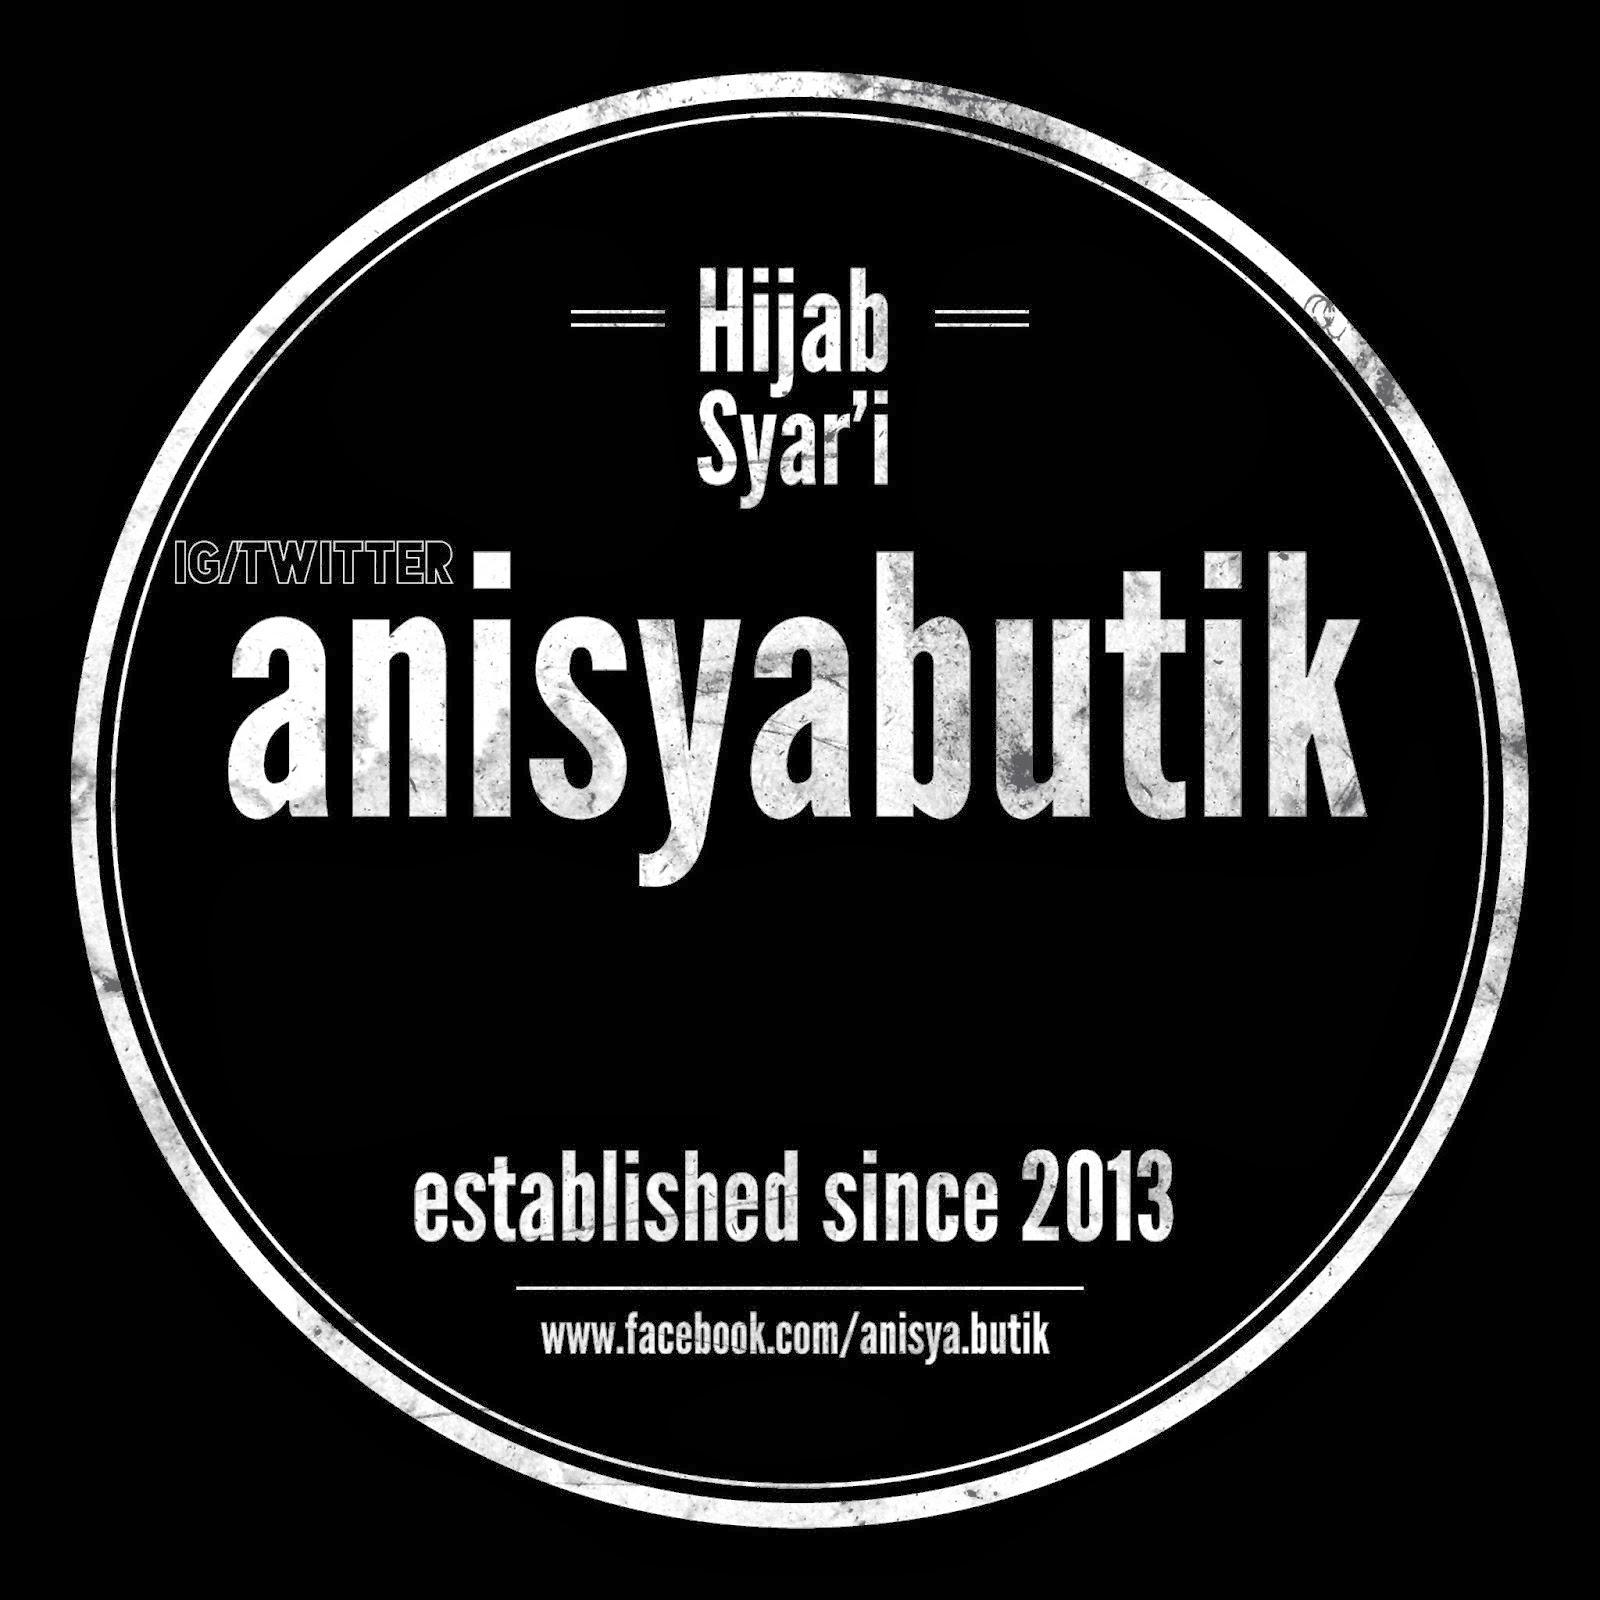 Anisya Butik